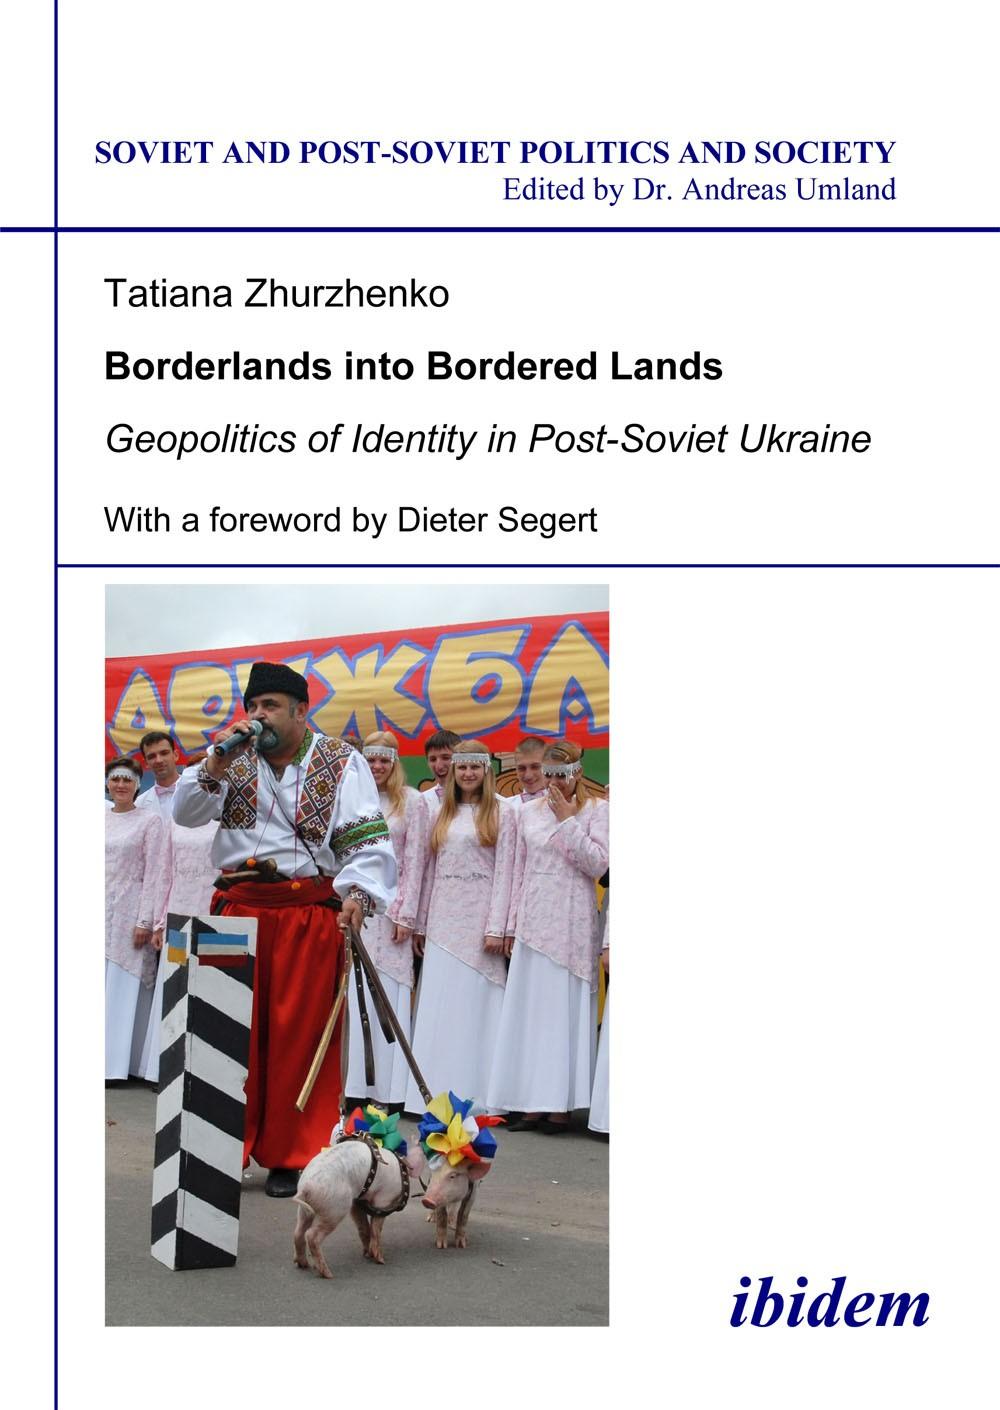 Borderlands into Bordered Lands. Geopolitics of Identity in Post-Soviet Ukraine